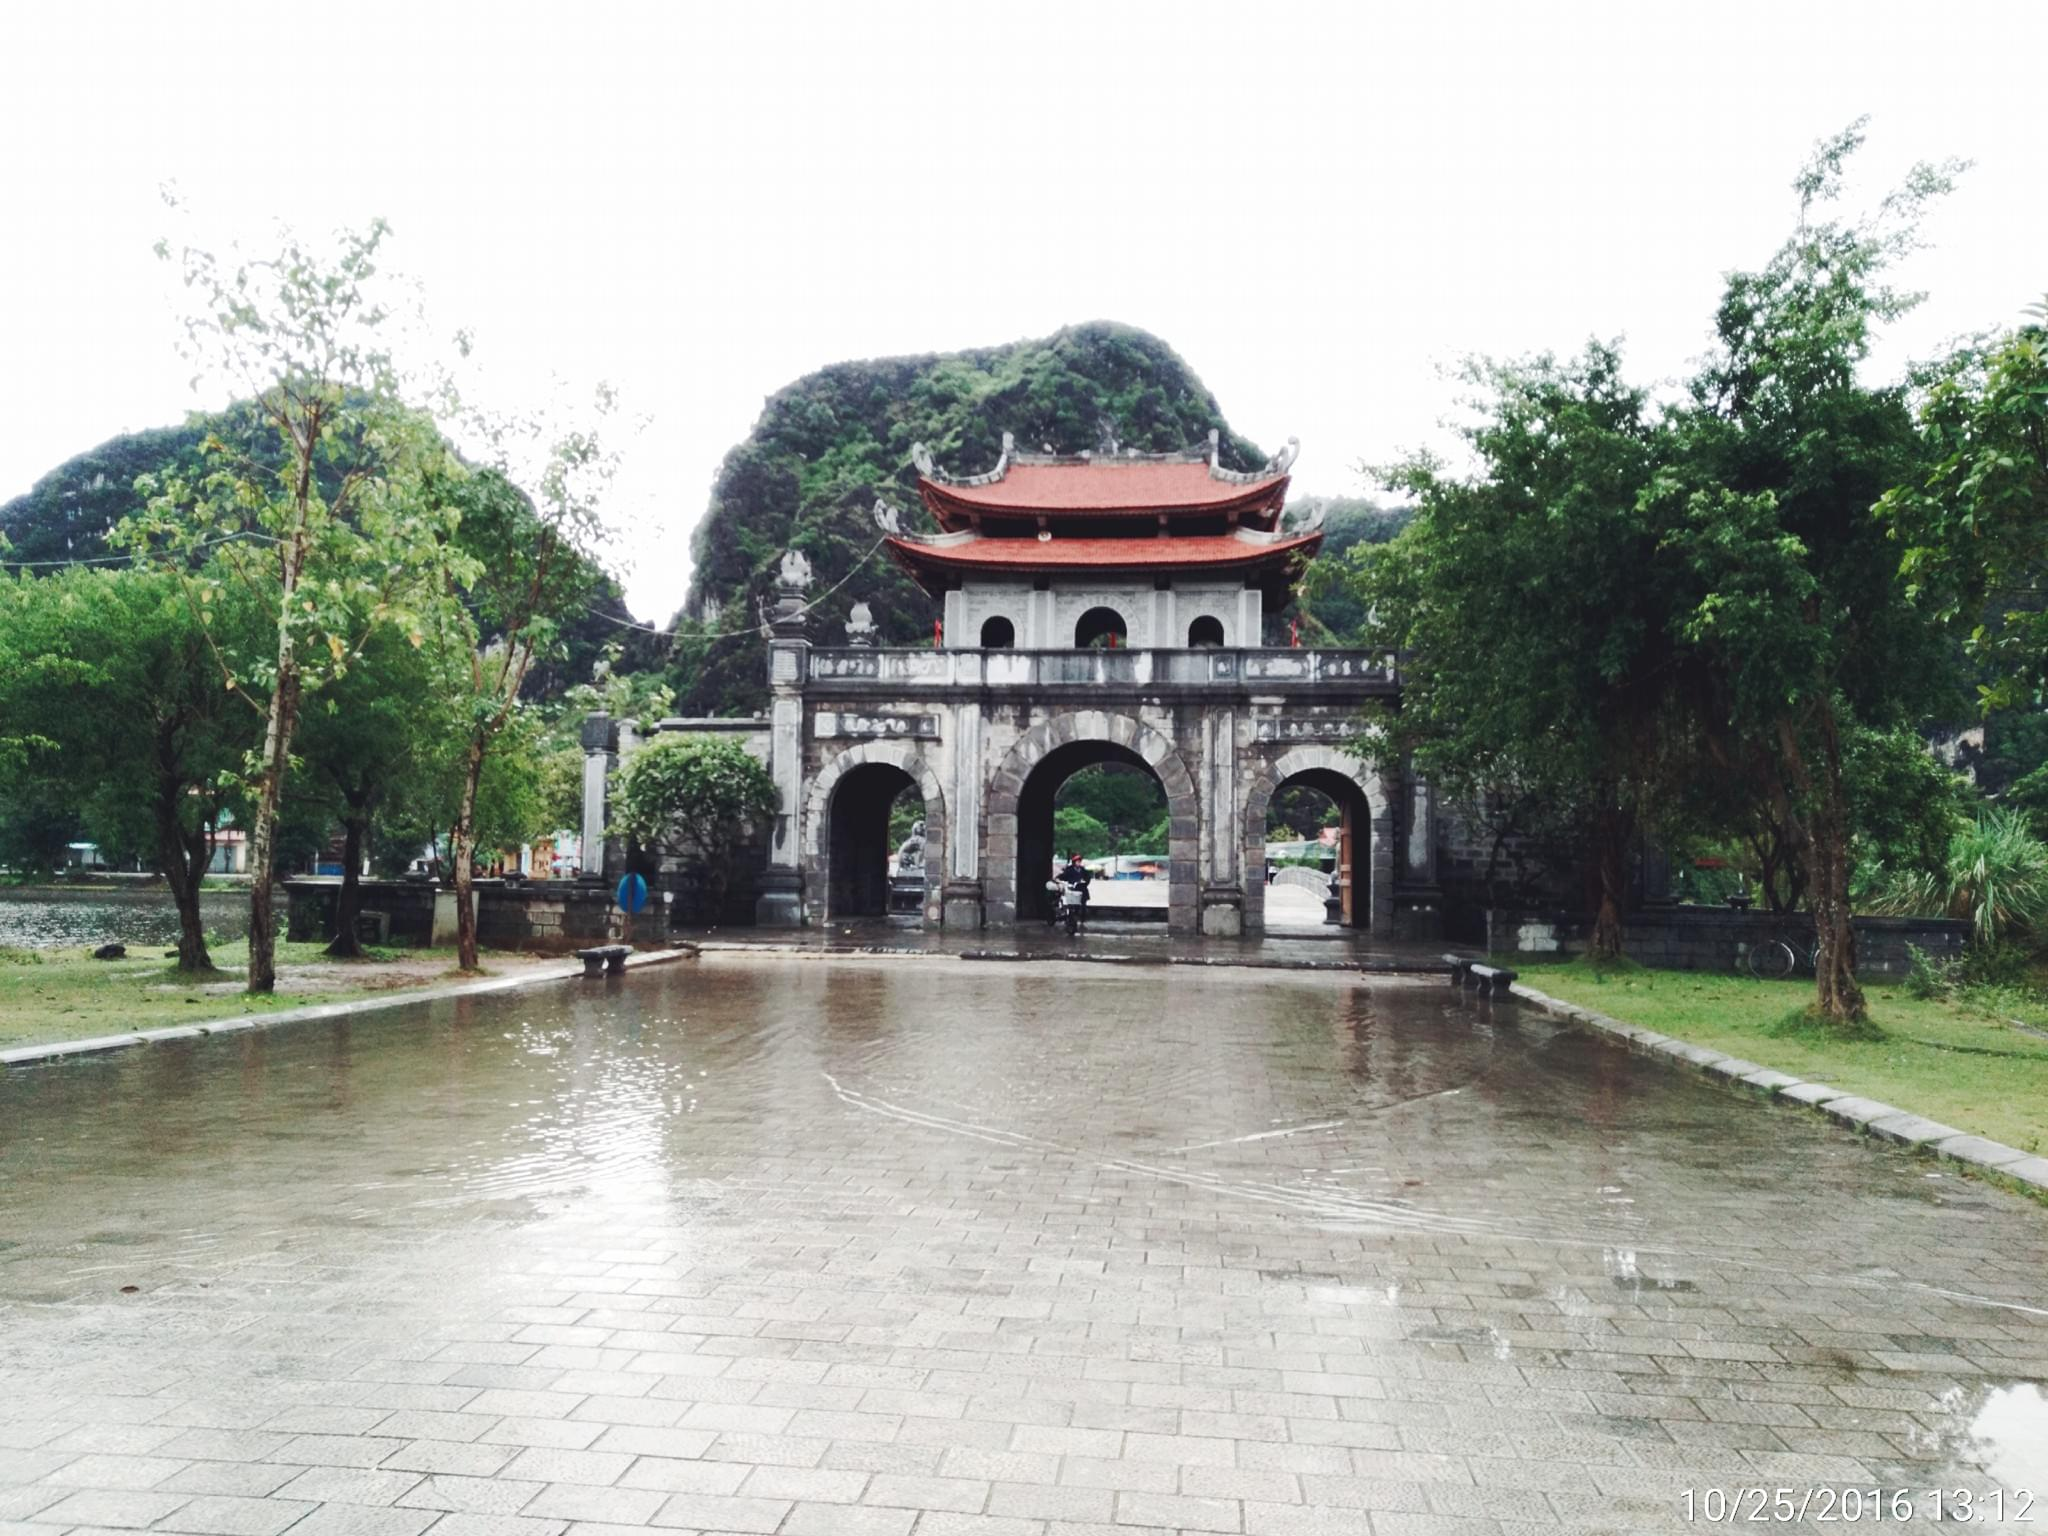 HOA LU-THUNG NHAM-1 DAY